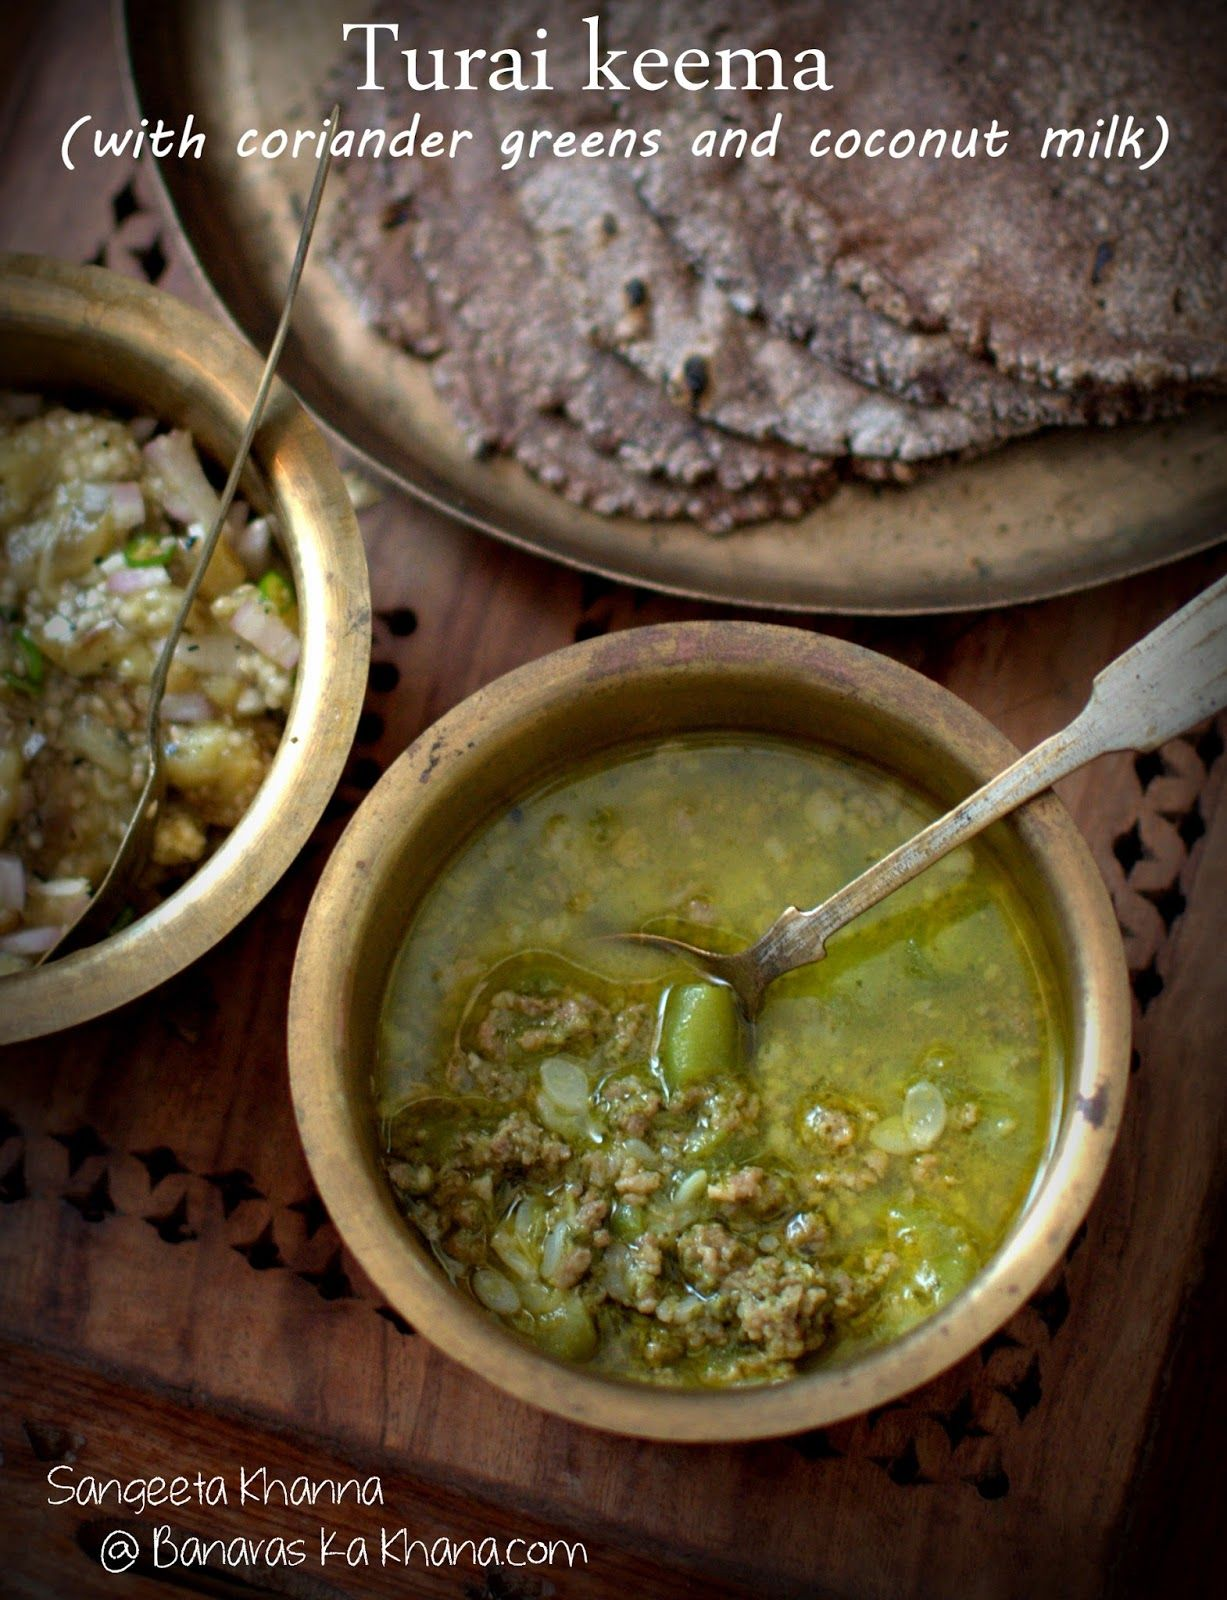 Banaras ka khana turai keema divine indian food pinterest banaras ka khana turai keema recipe with coriander greens and coconut milk forumfinder Choice Image